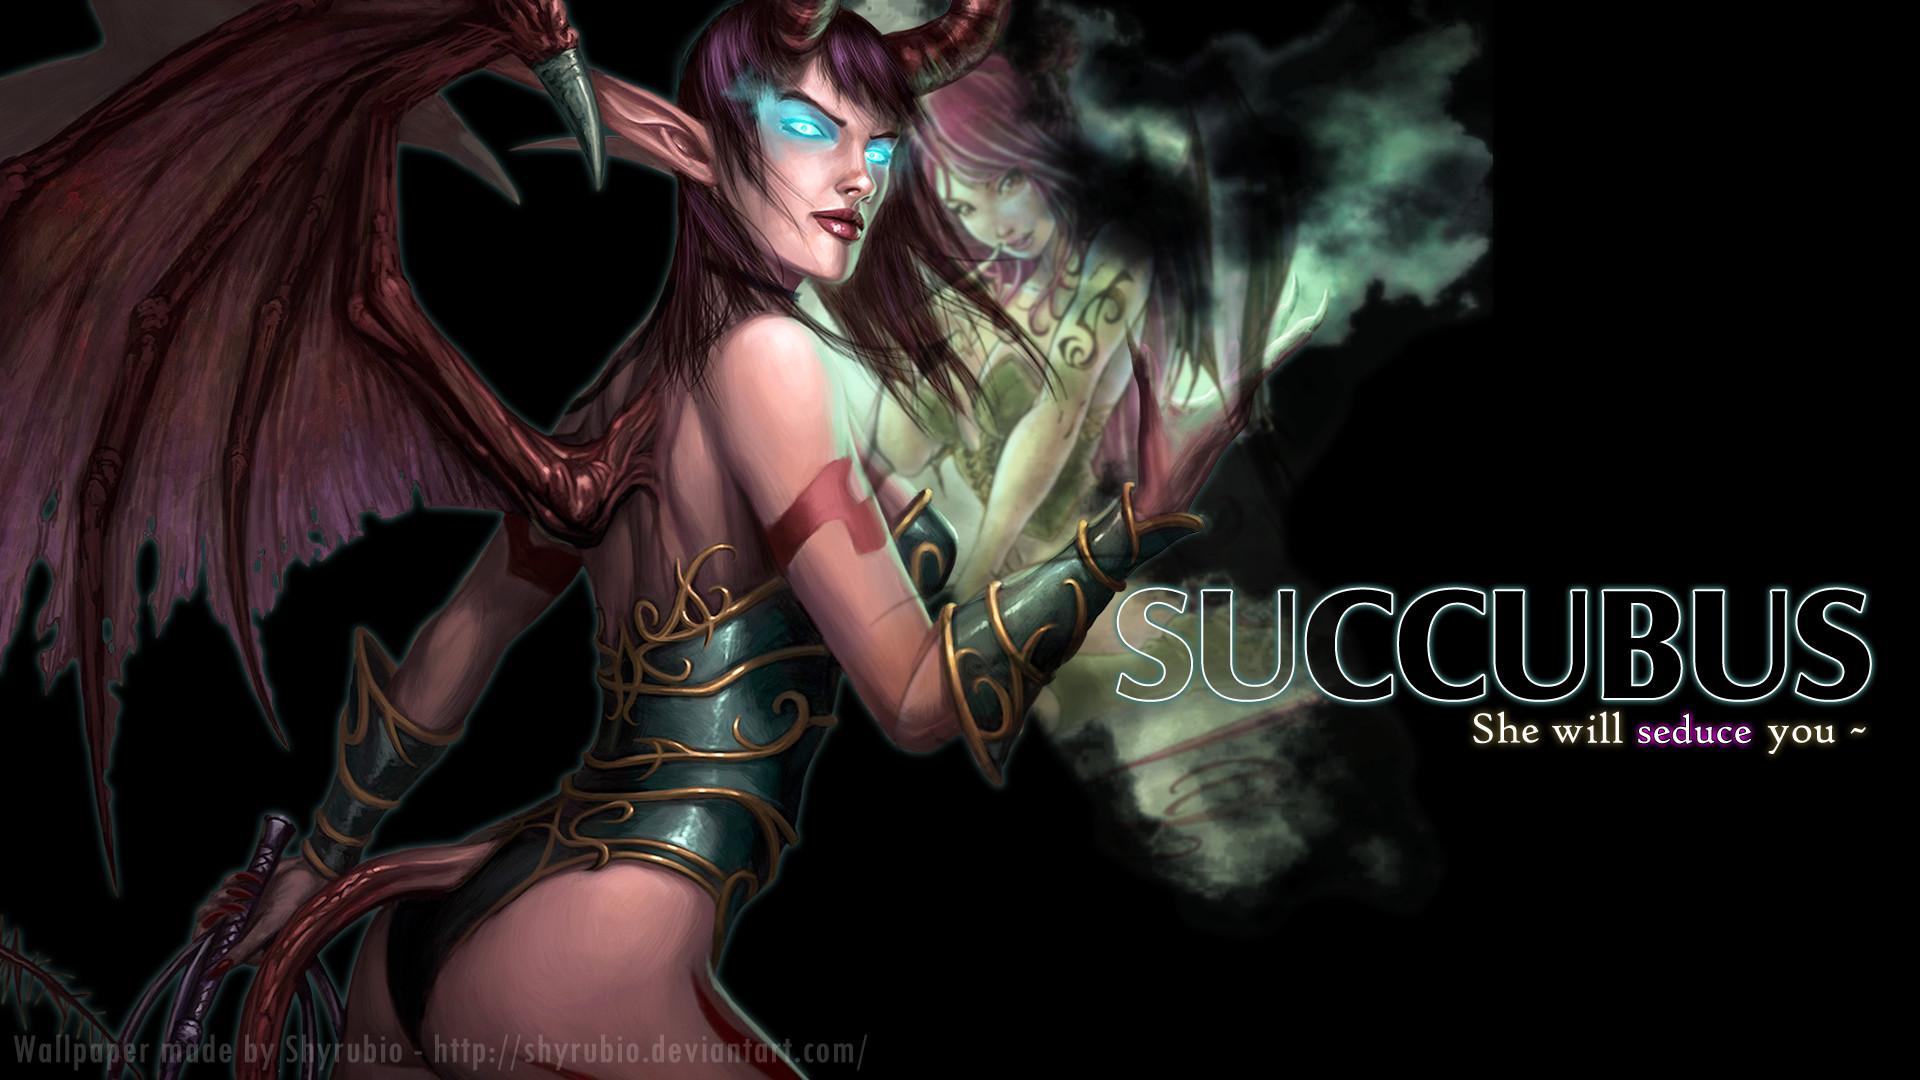 Succubus by shyrubio on DeviantArt